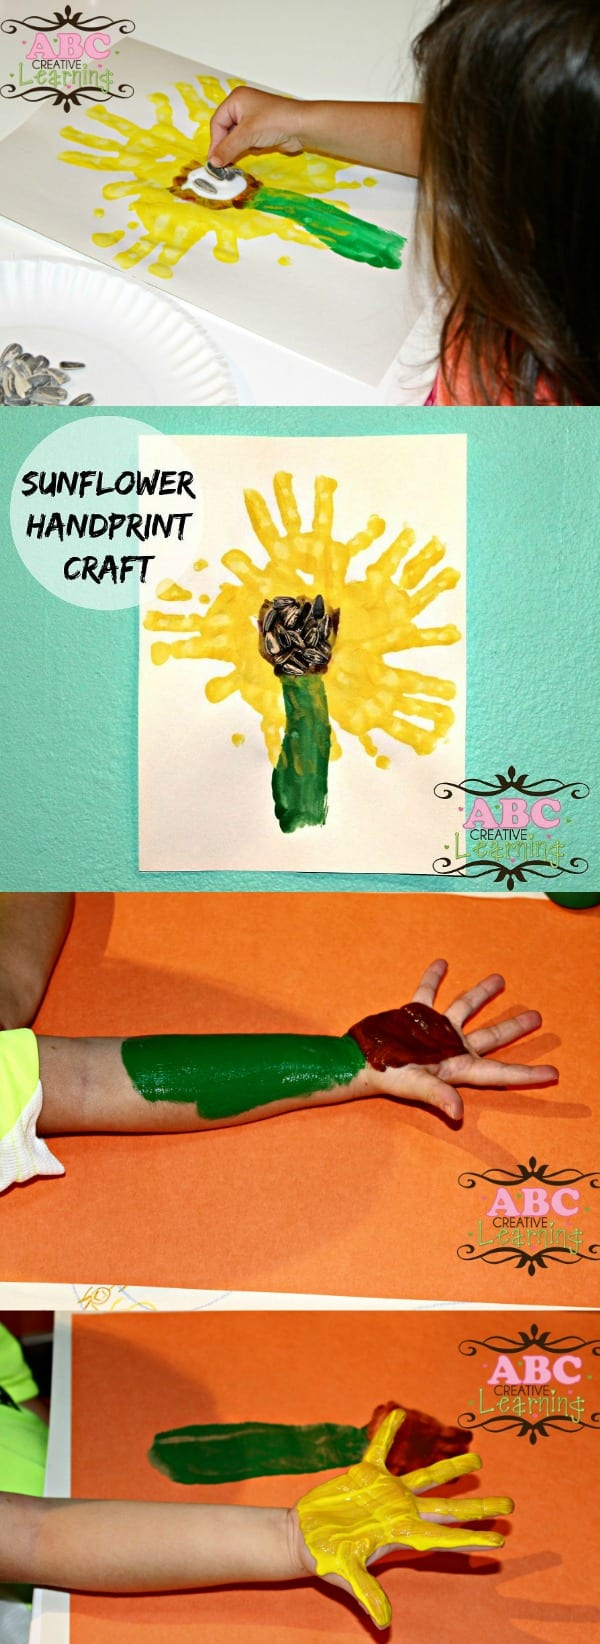 Sunflower Handprint Craft